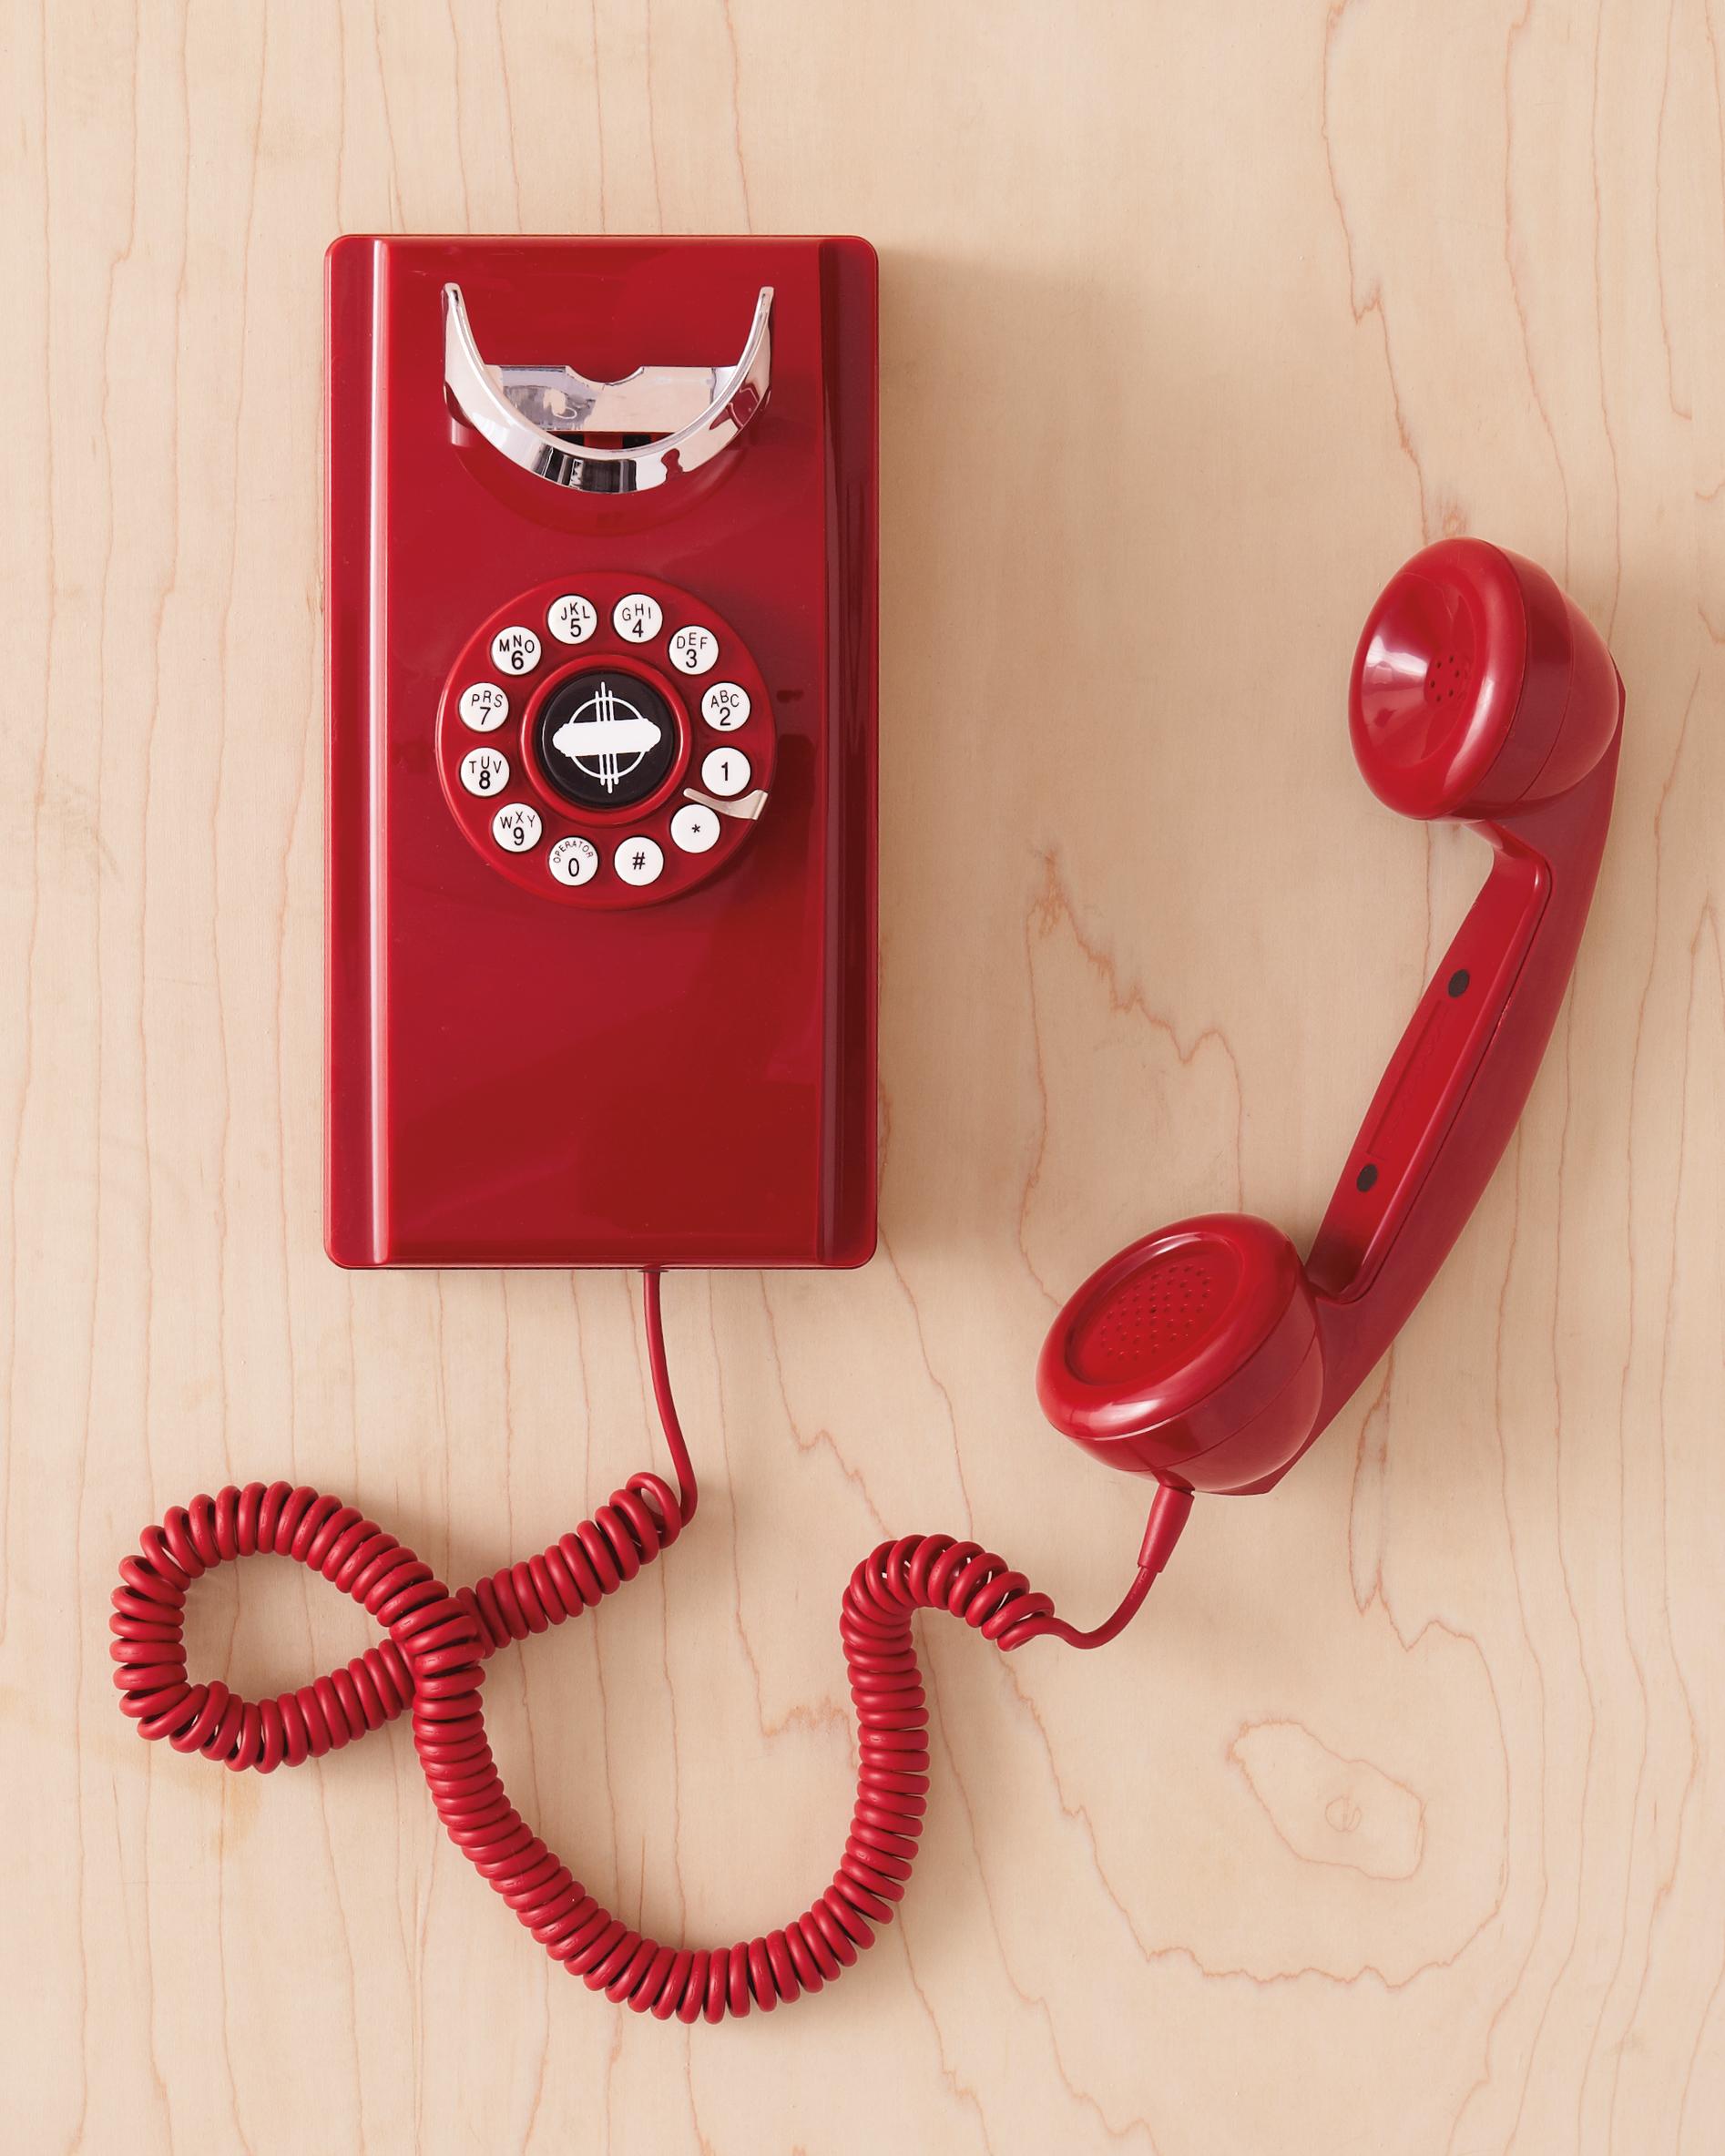 phone-013-mwd109796.jpg